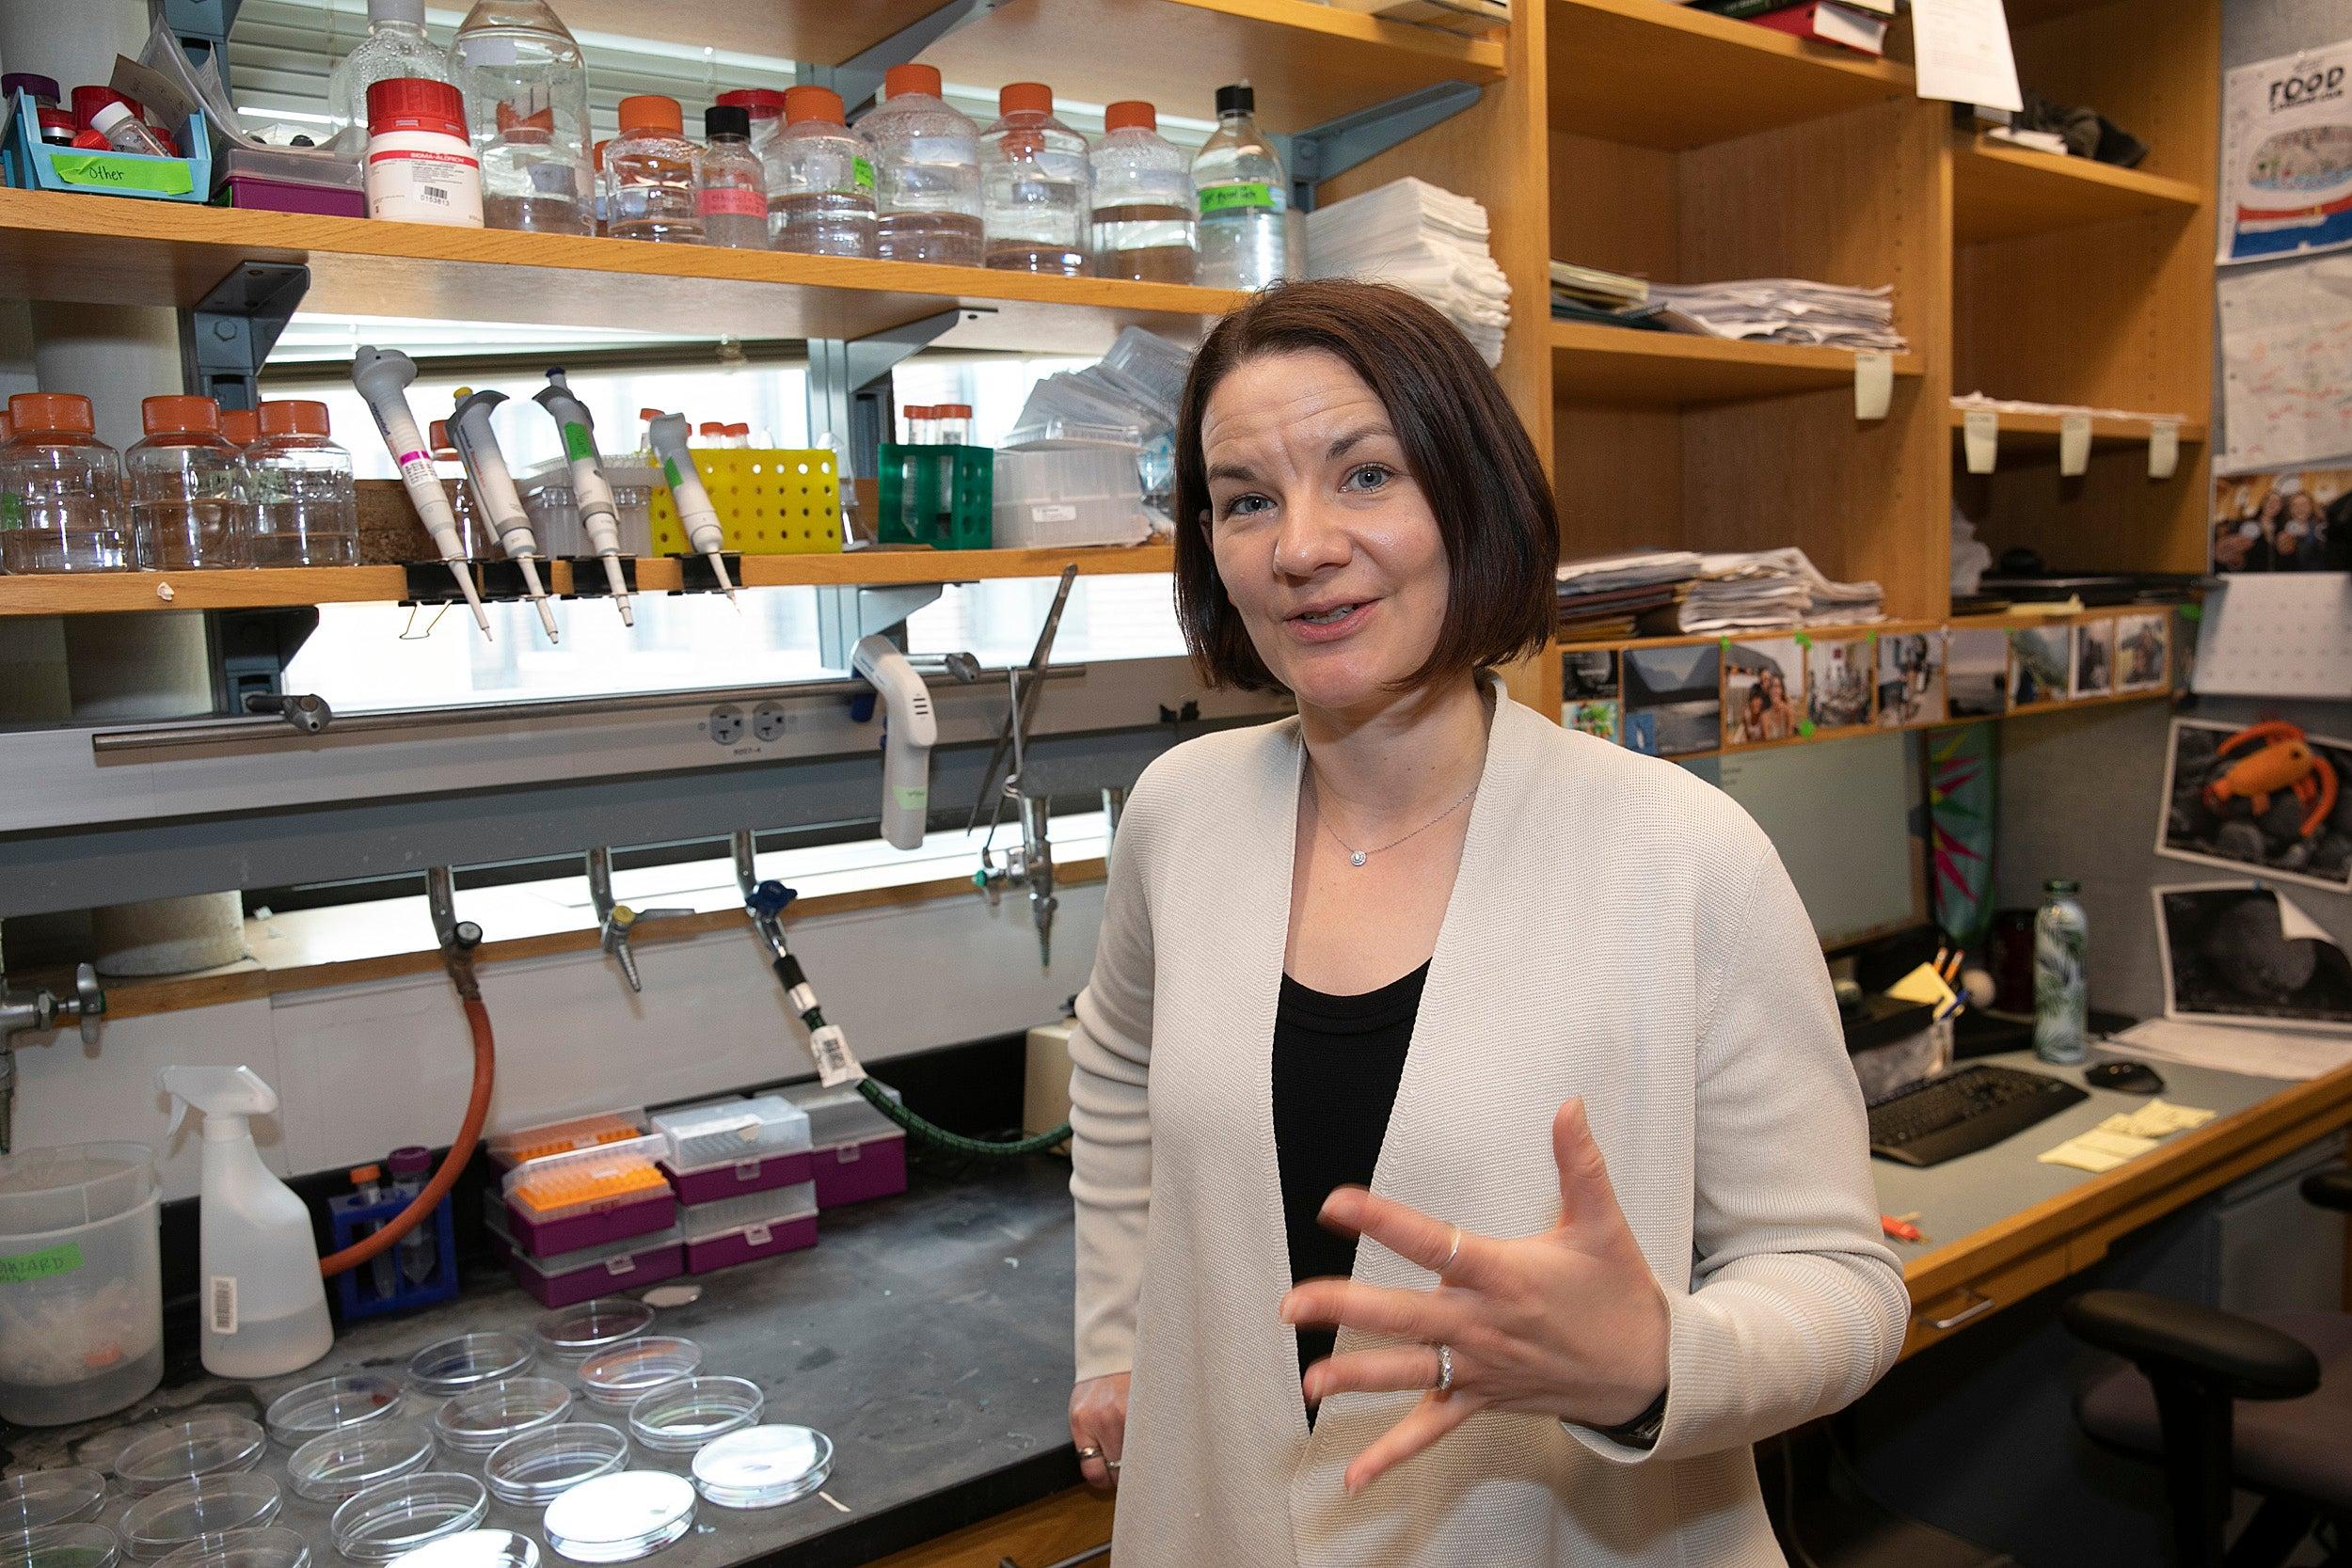 Professor Emily Balskus explains a scientific process in the lab